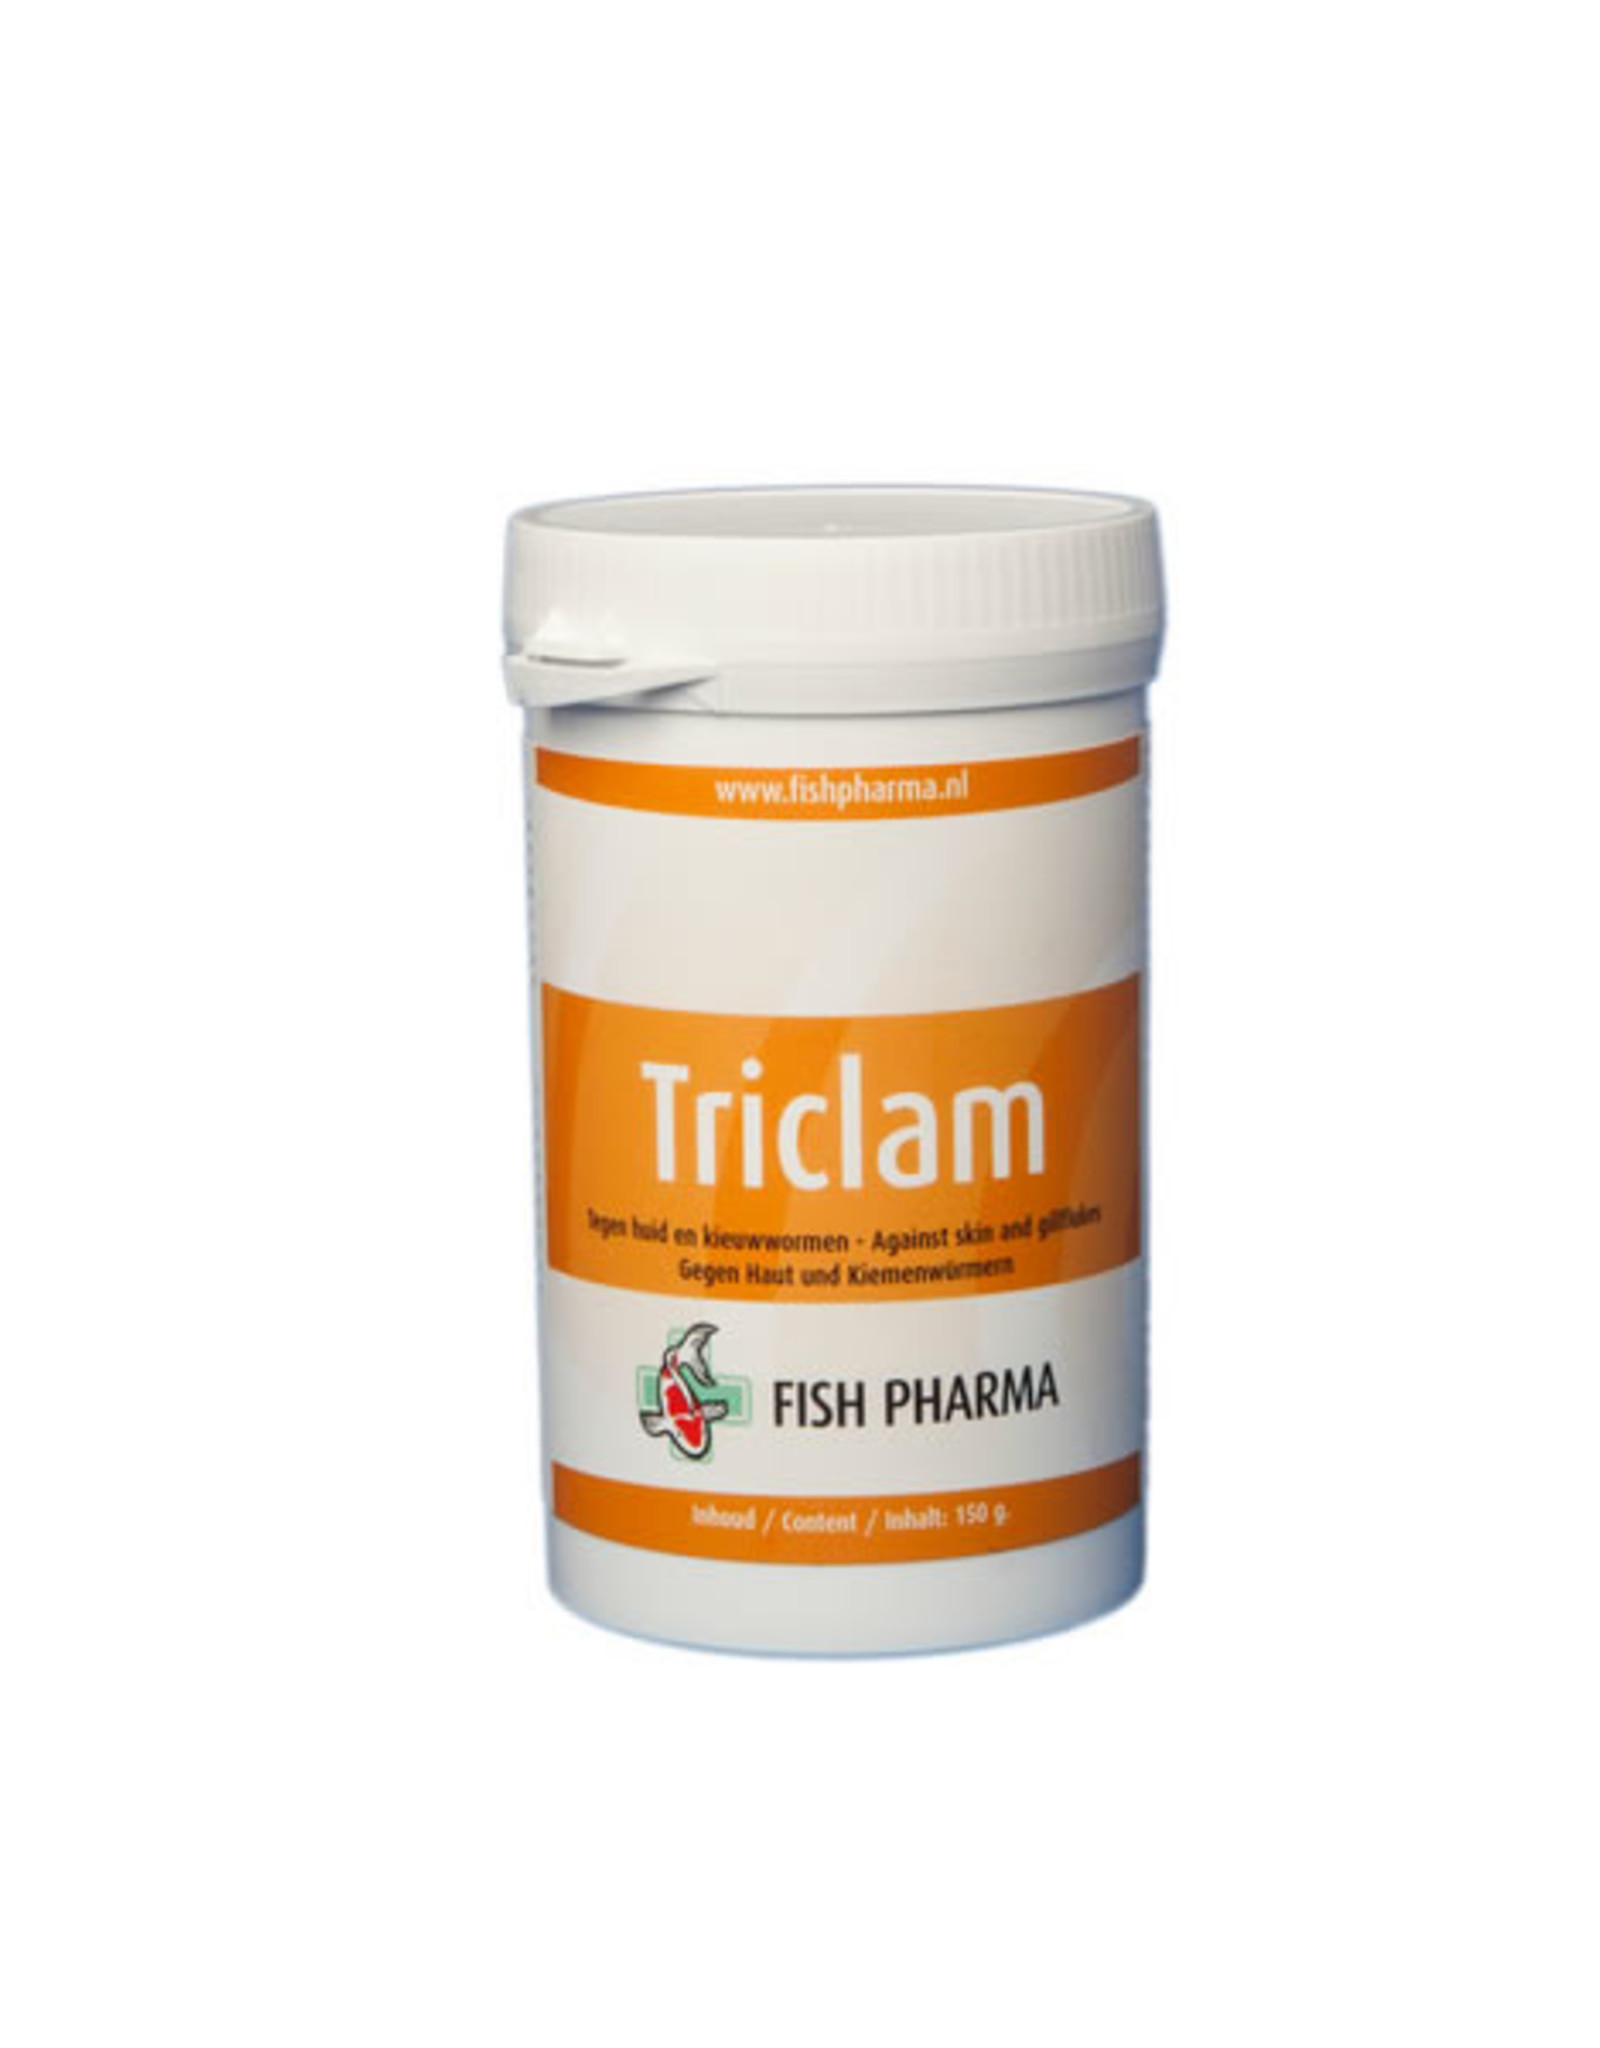 Fish Pharma Triclam gegen Haut- und Kiemenwürmer